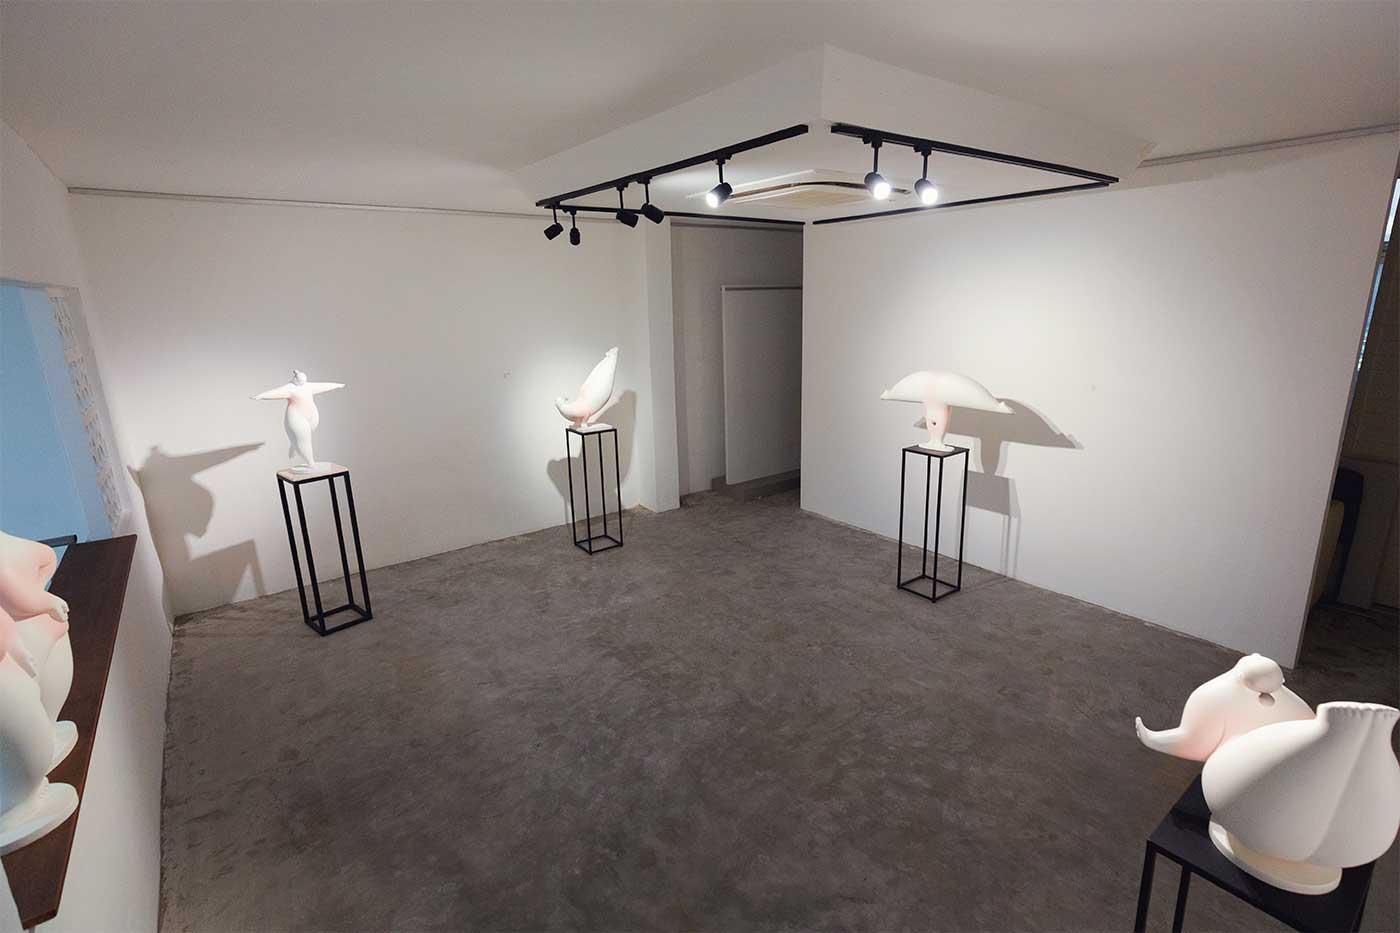 Internal Photo of Asian Art Platforms Gallery Space